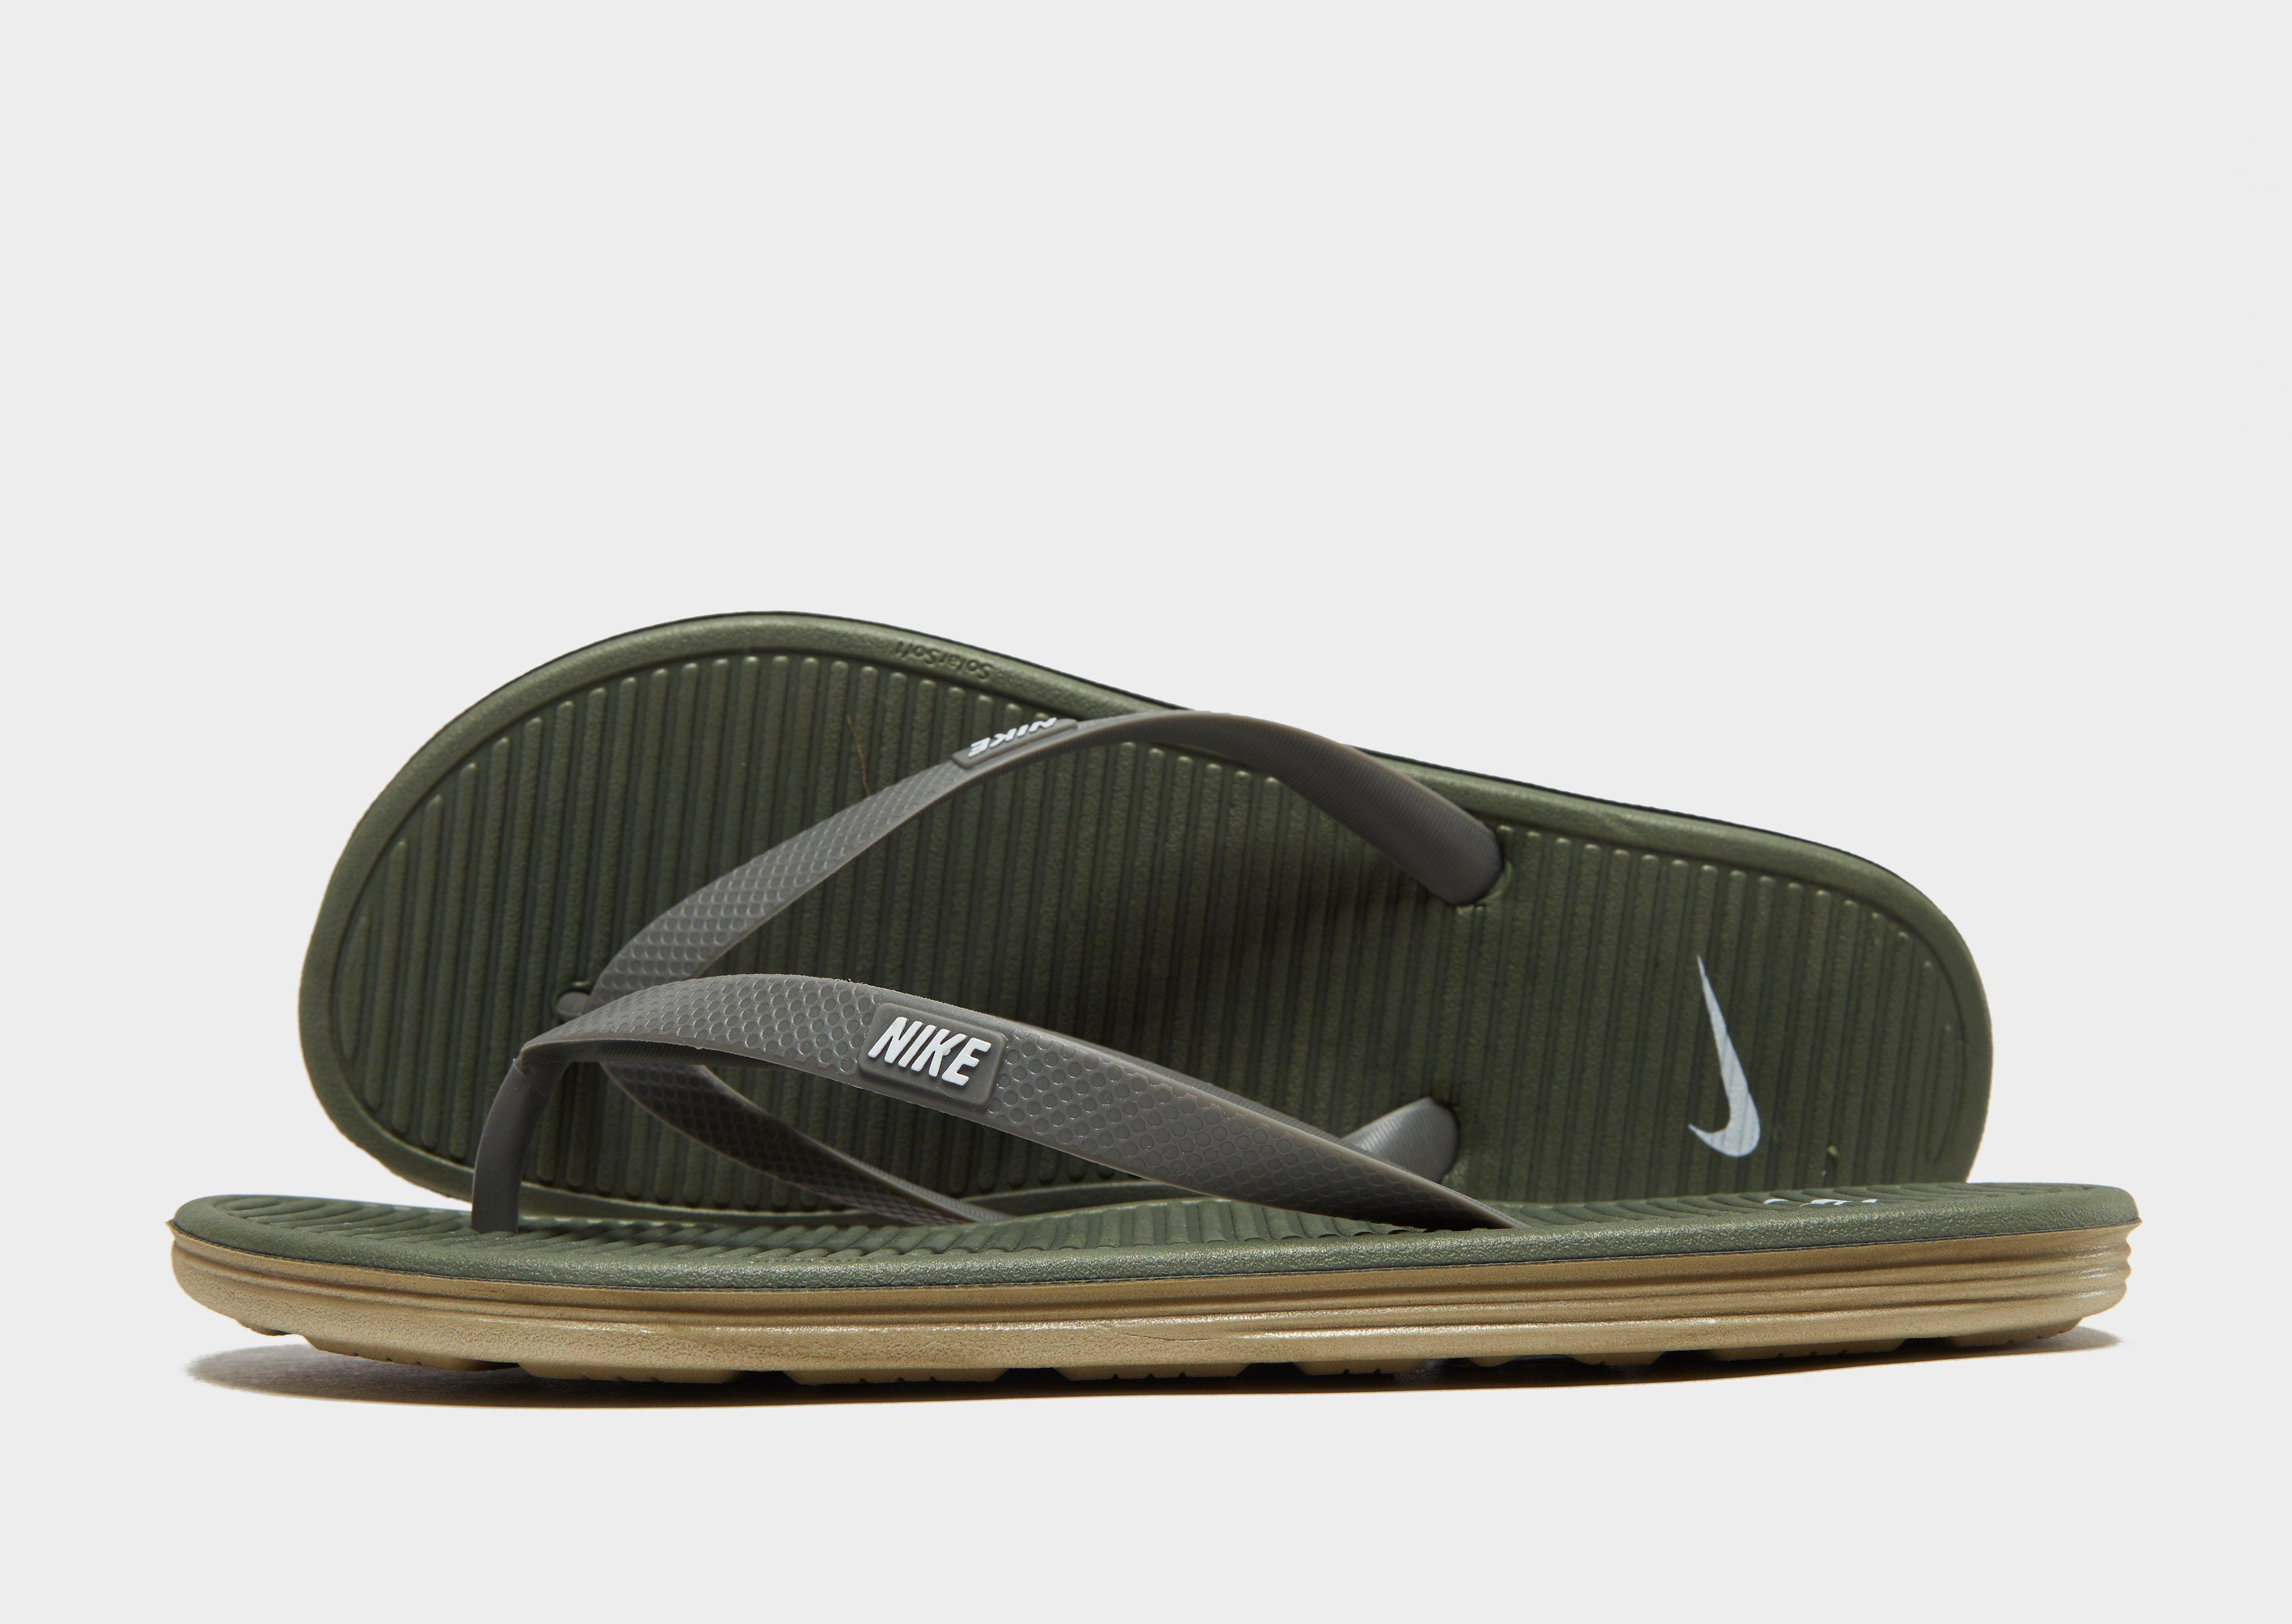 b519208729b8 Nike Solarsoft II Flip Flops